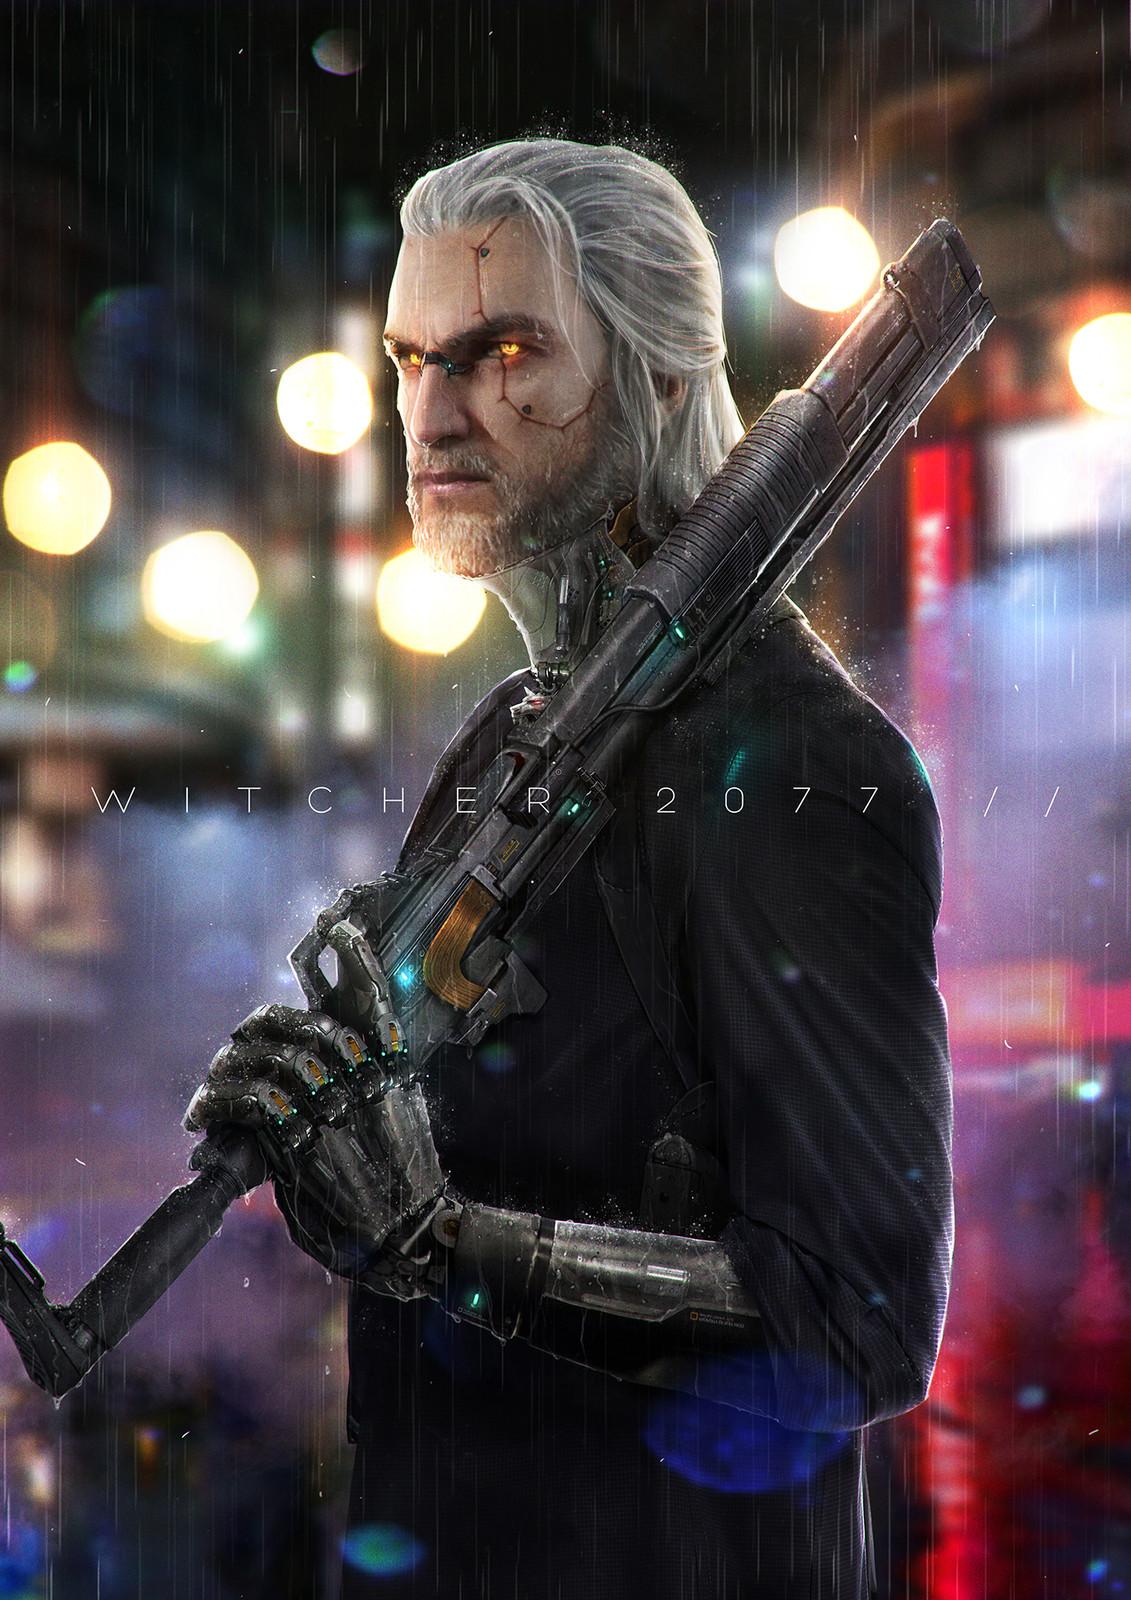 Witcher 2077